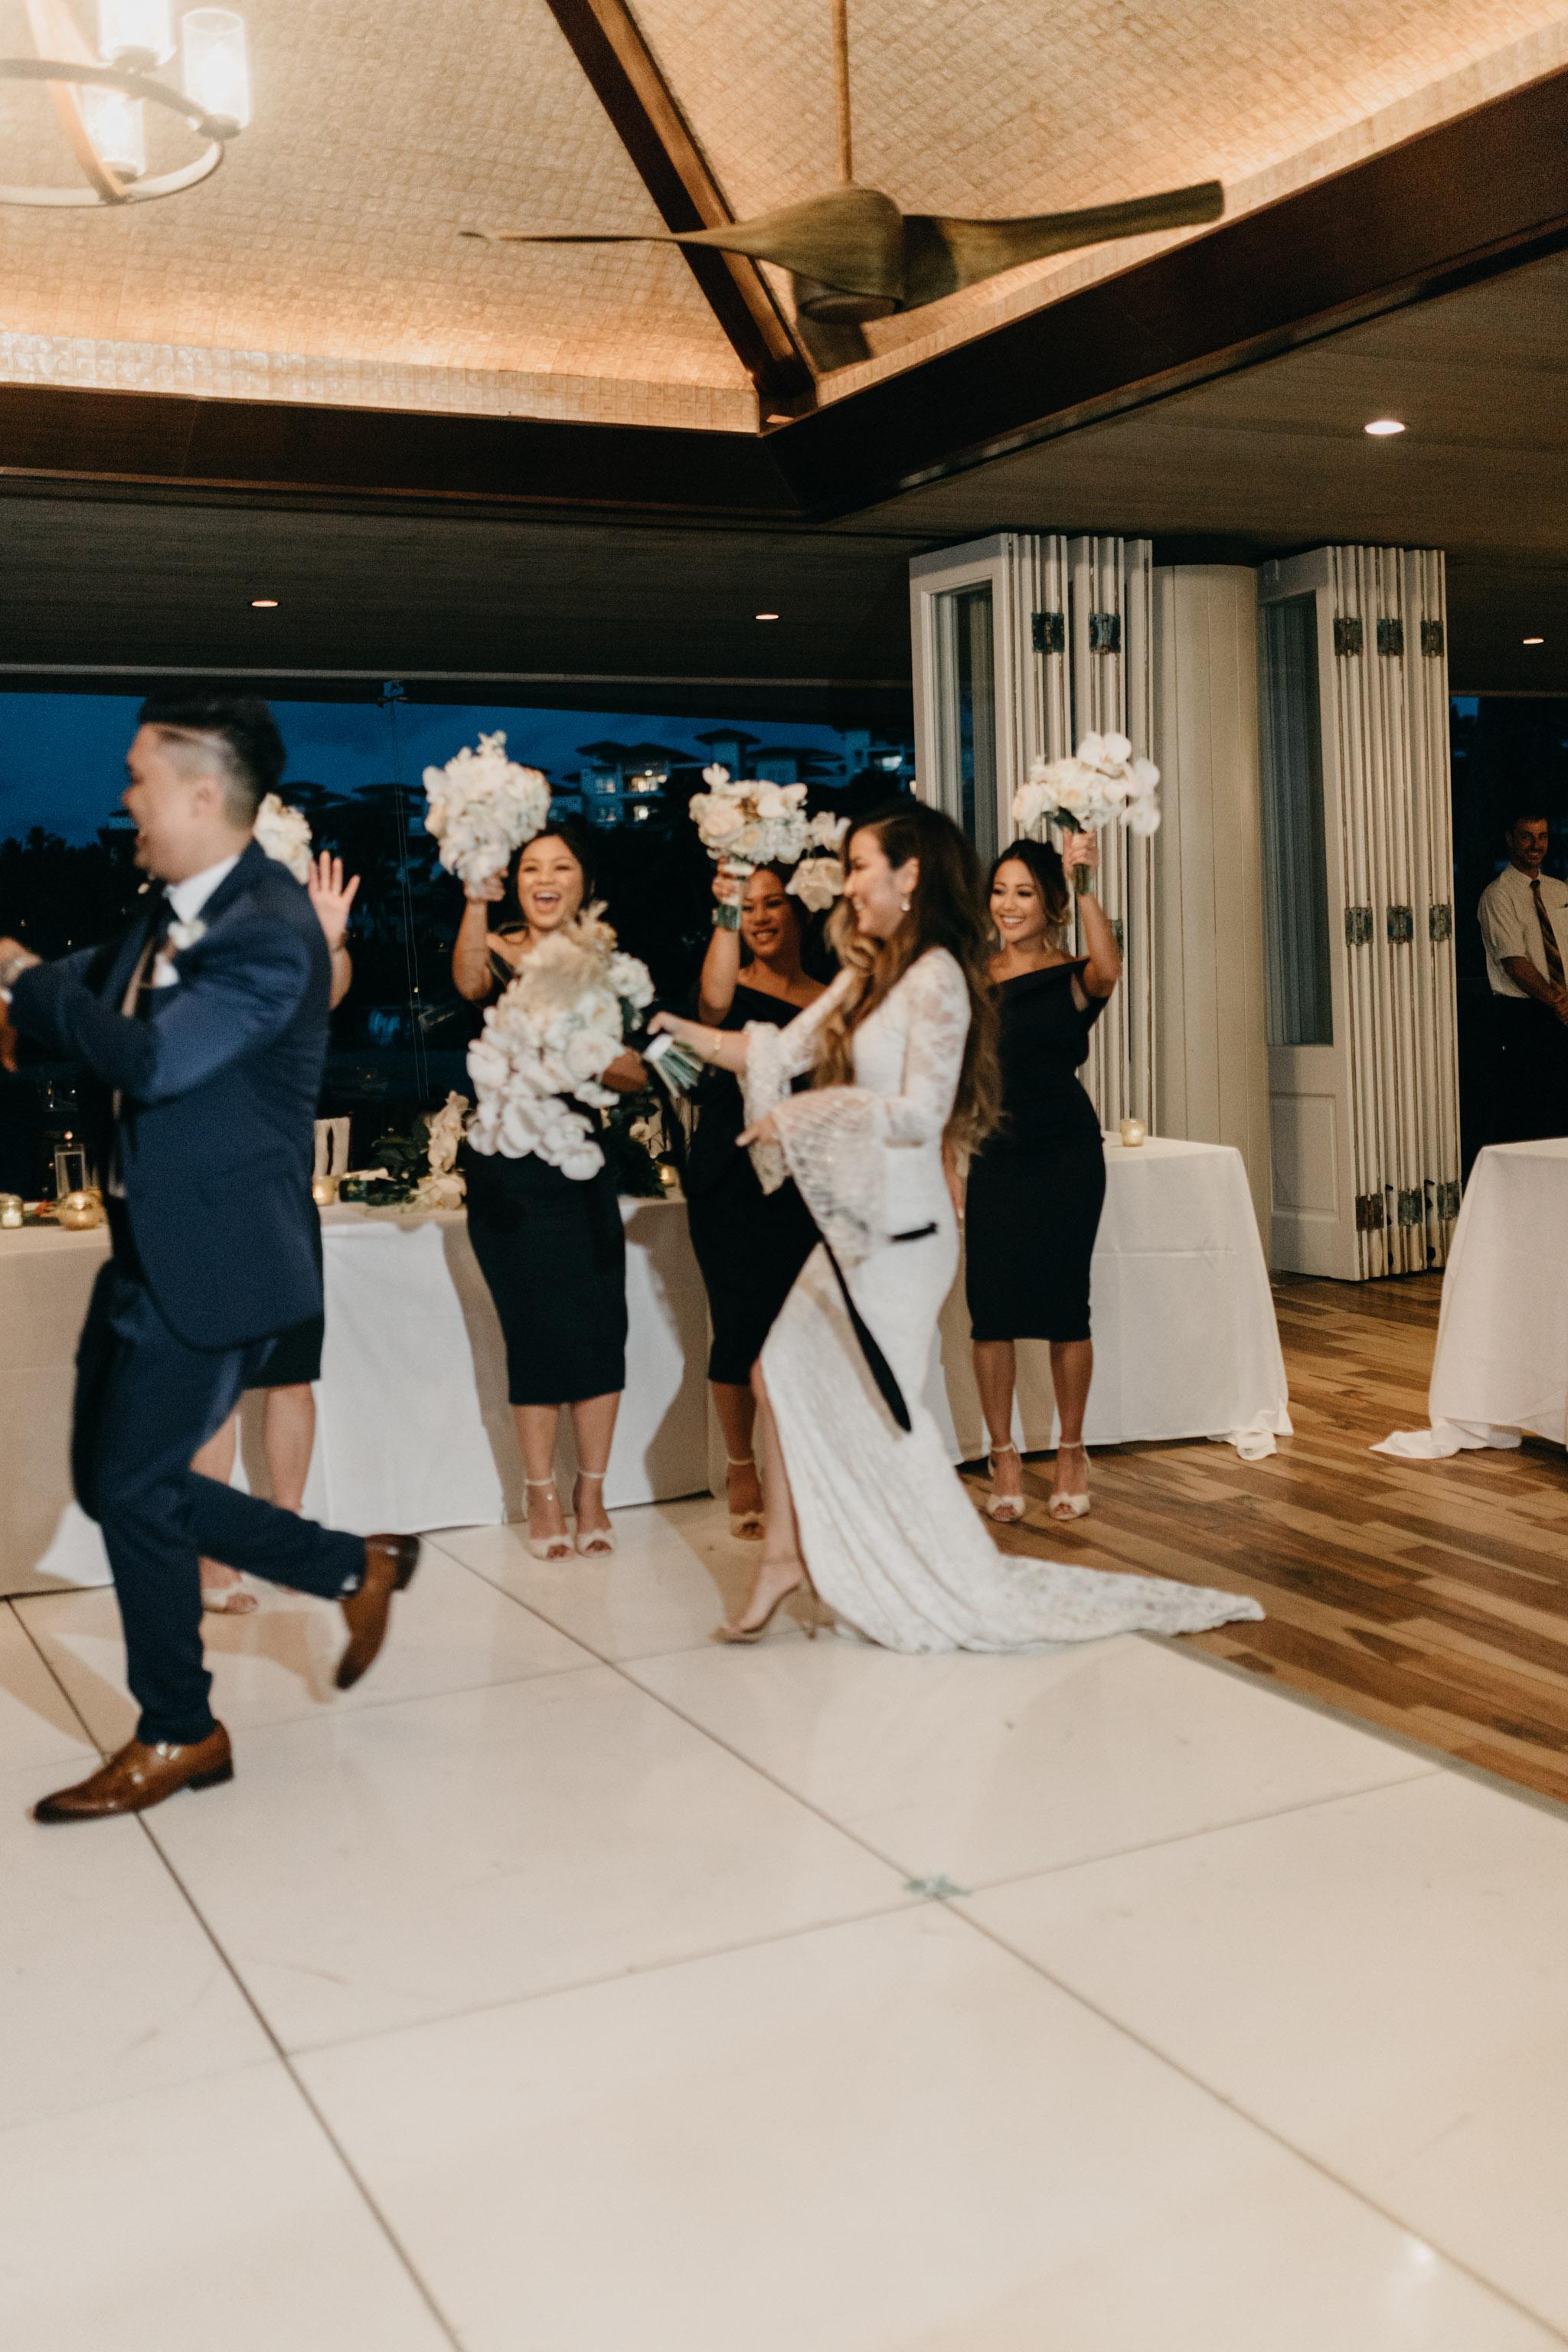 Bride & groom grand entrance   Merriman's Kapalua Maui wedding by Hawaii wedding photographer Desiree Leilani